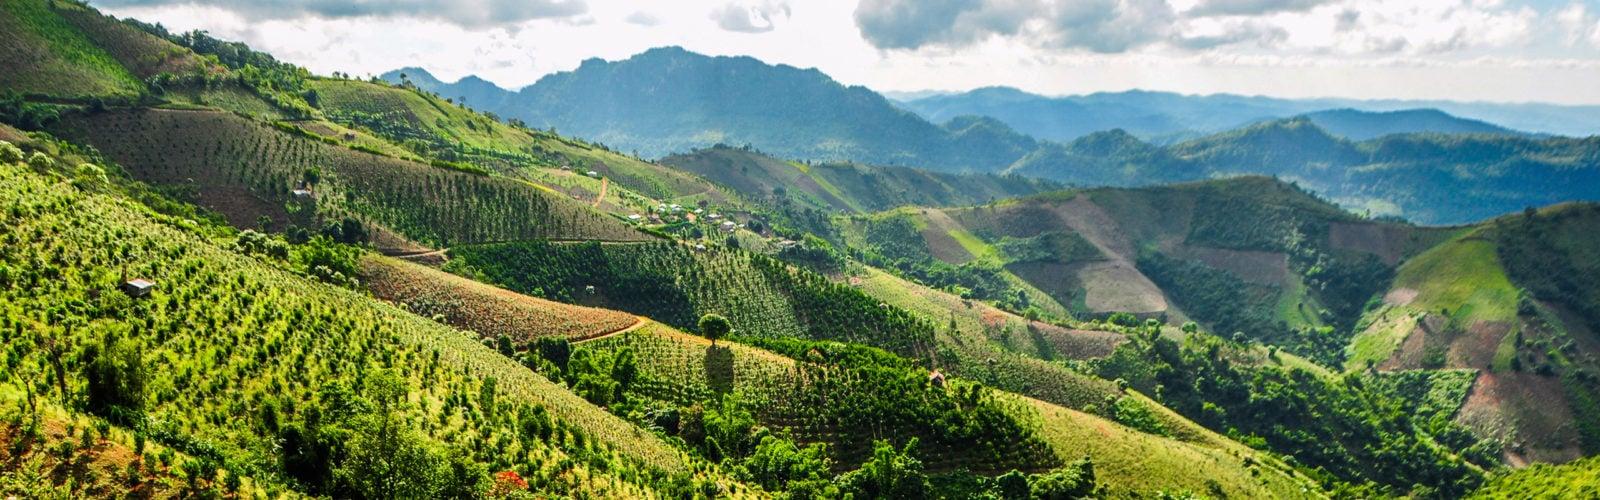 kalaw-hills